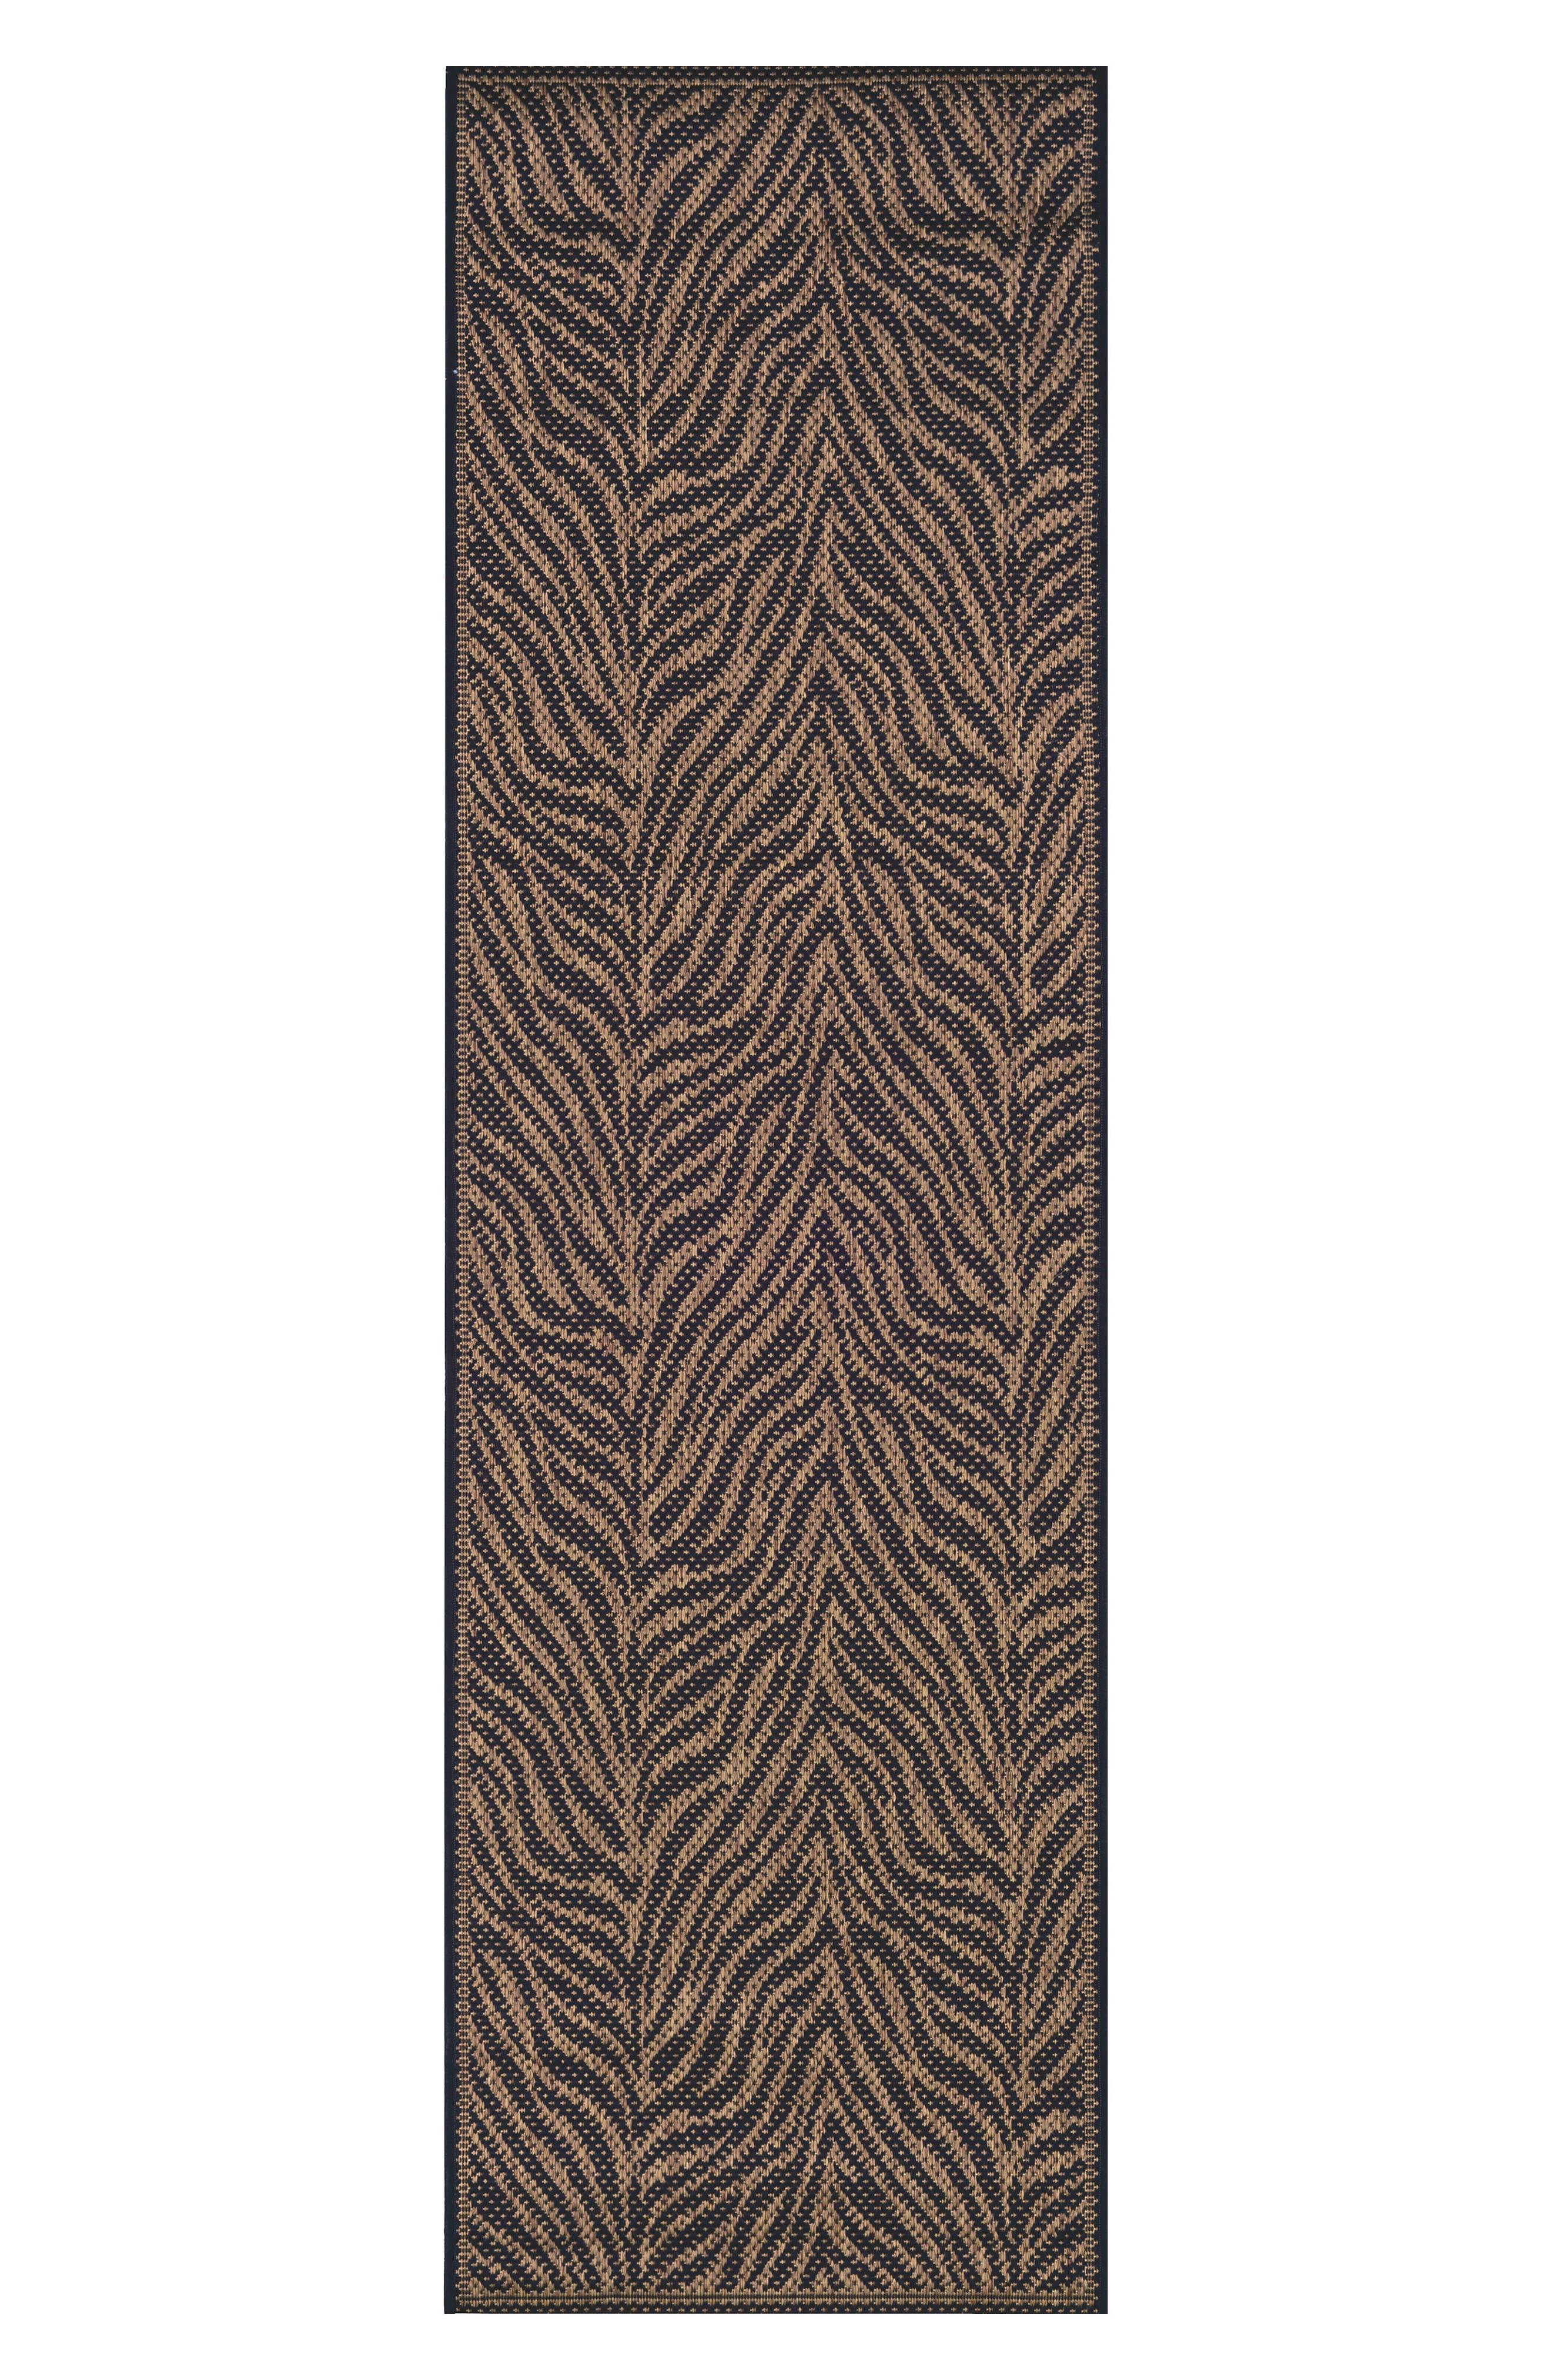 Recife Zebra Indoor/Outdoor Rug,                             Alternate thumbnail 3, color,                             BLACK/ COCOA